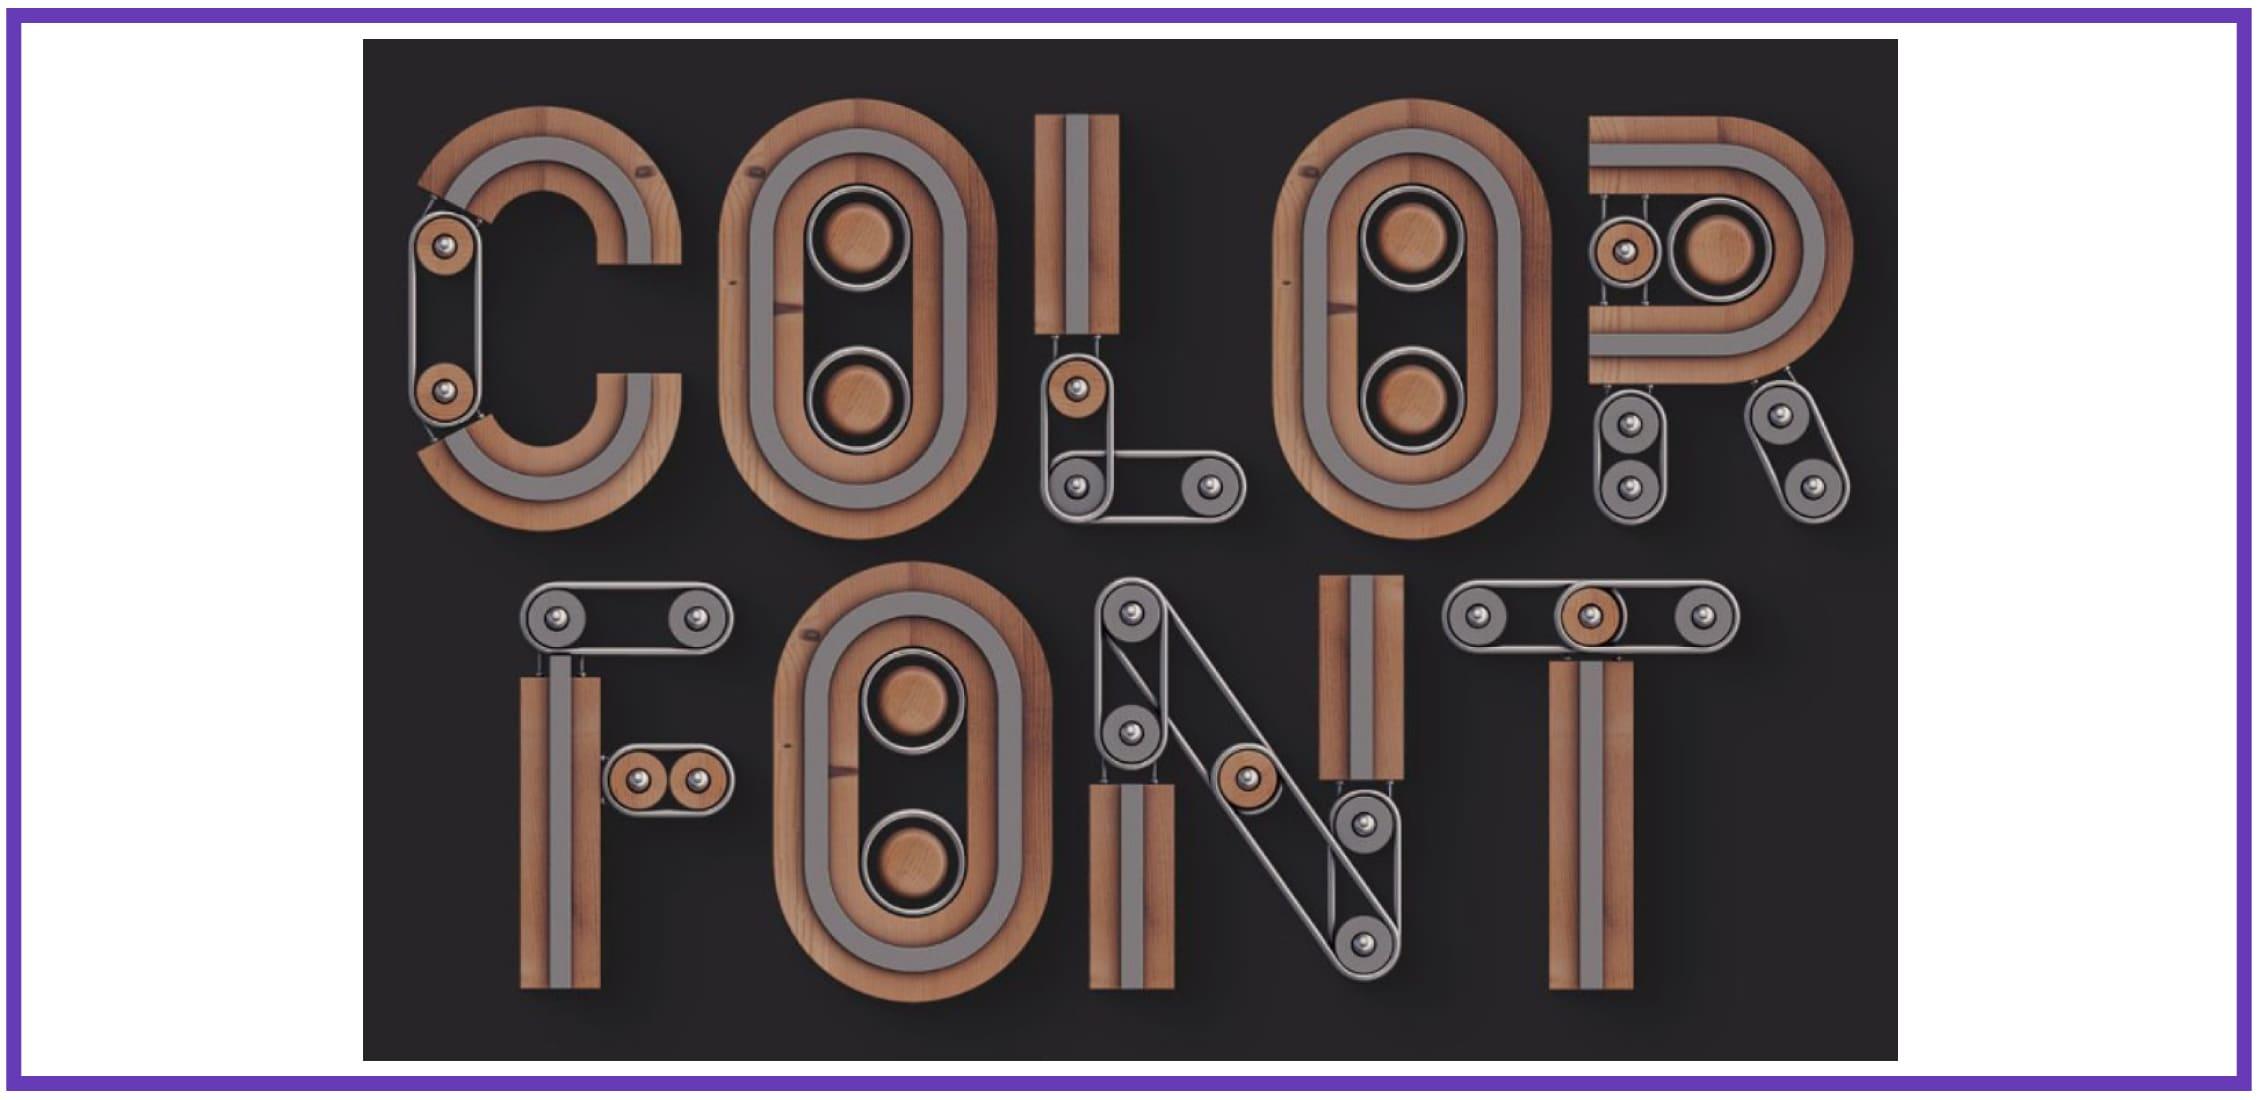 Creator - Color SVG Font By Deeezy. Best Industrial Fonts.